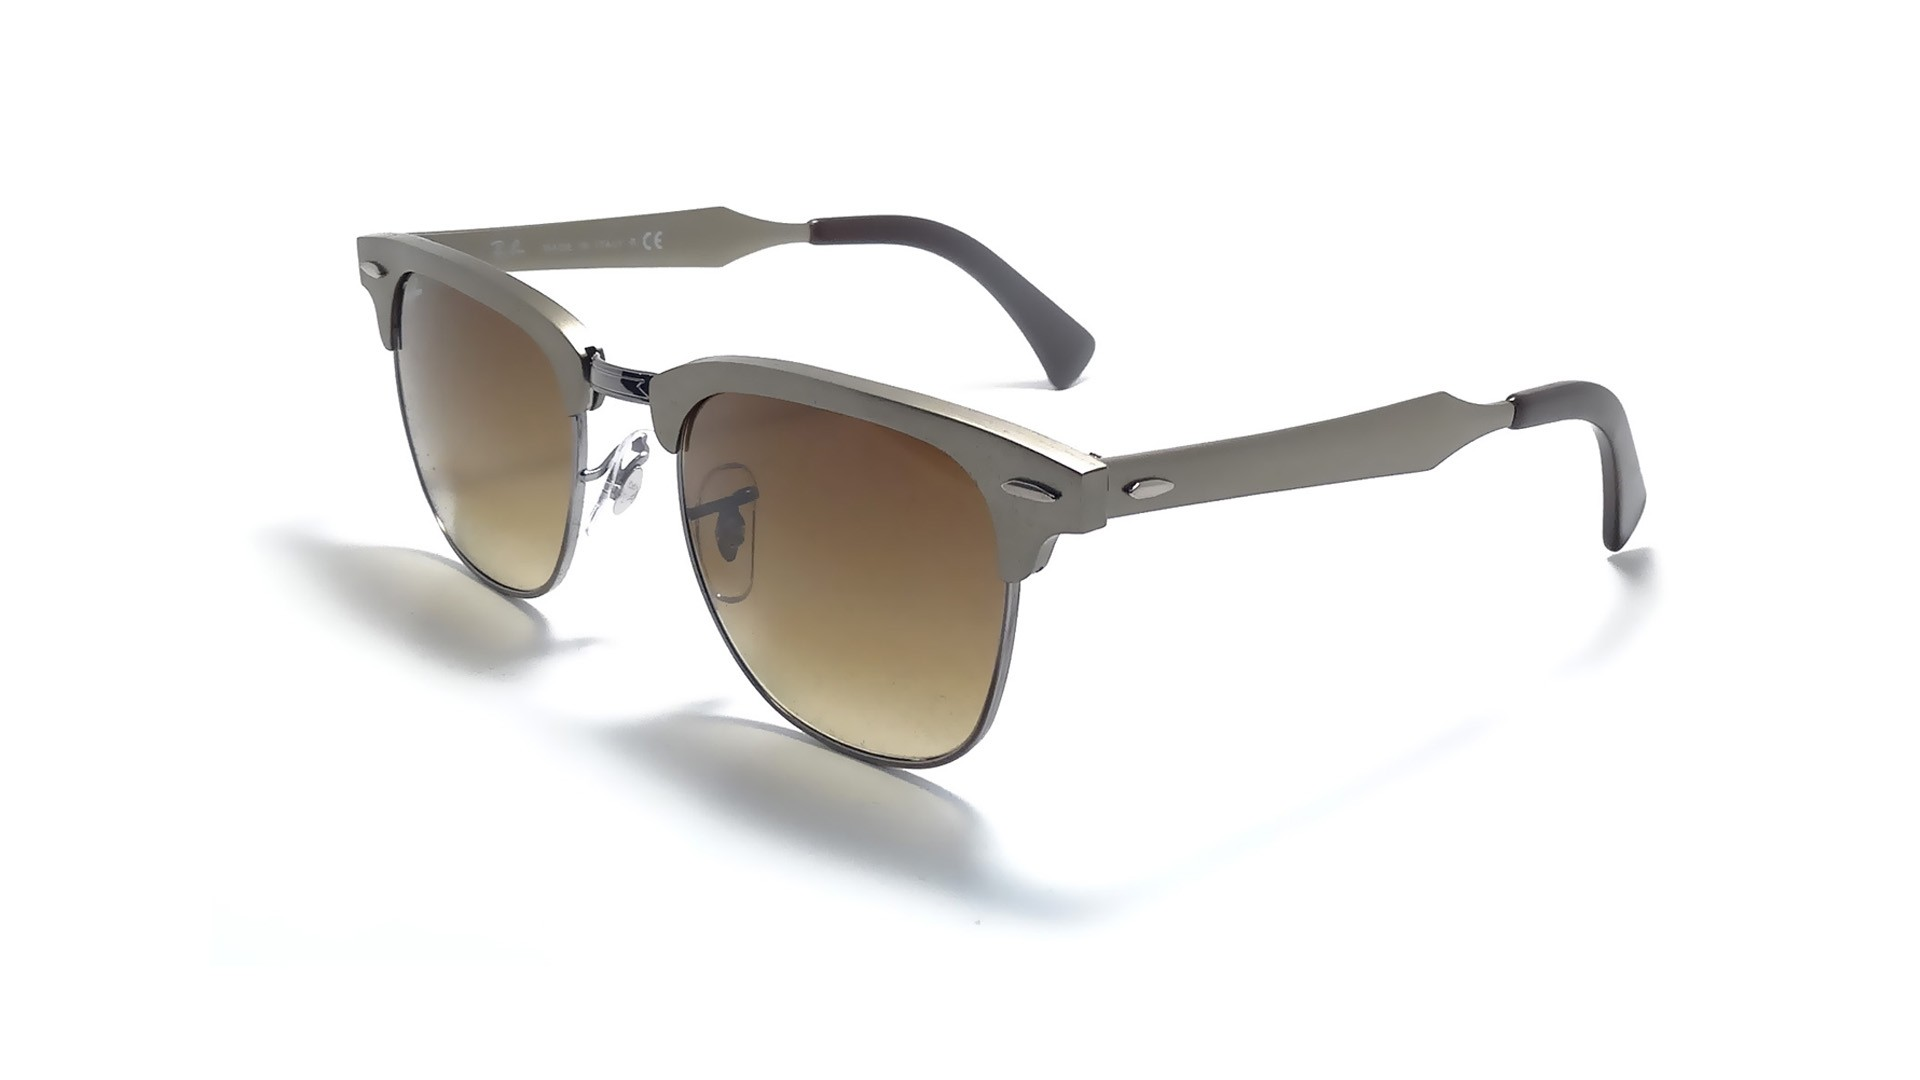 Ray Ban Clubmaster Aluminum Rb 3507 13740 Silver Frame WGrey Mirror New 13740 51 21 WGrey Sunglasses